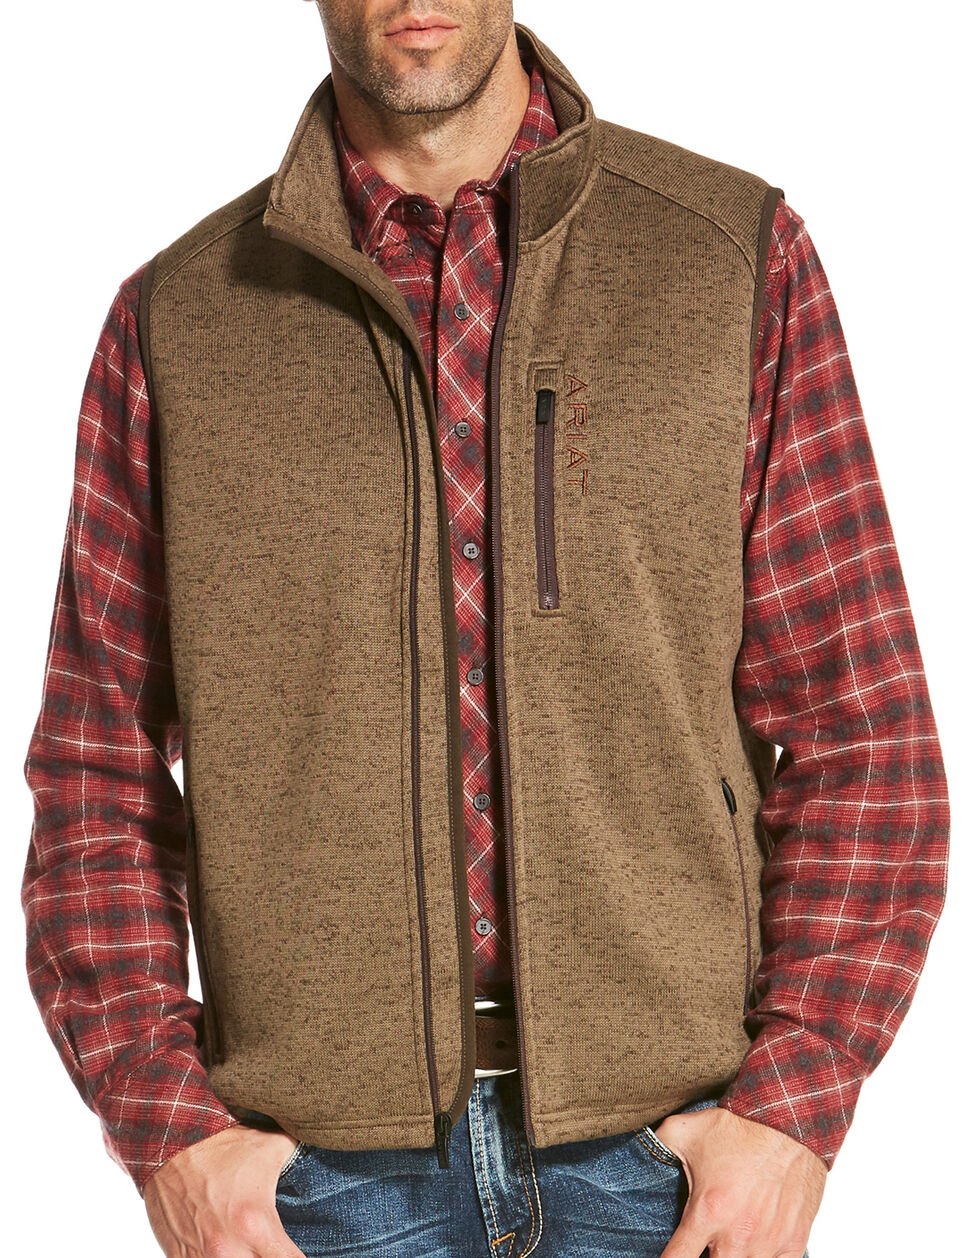 Ariat Men's Light Brown Caldwell Full Zip Vest, Light Brown, hi-res